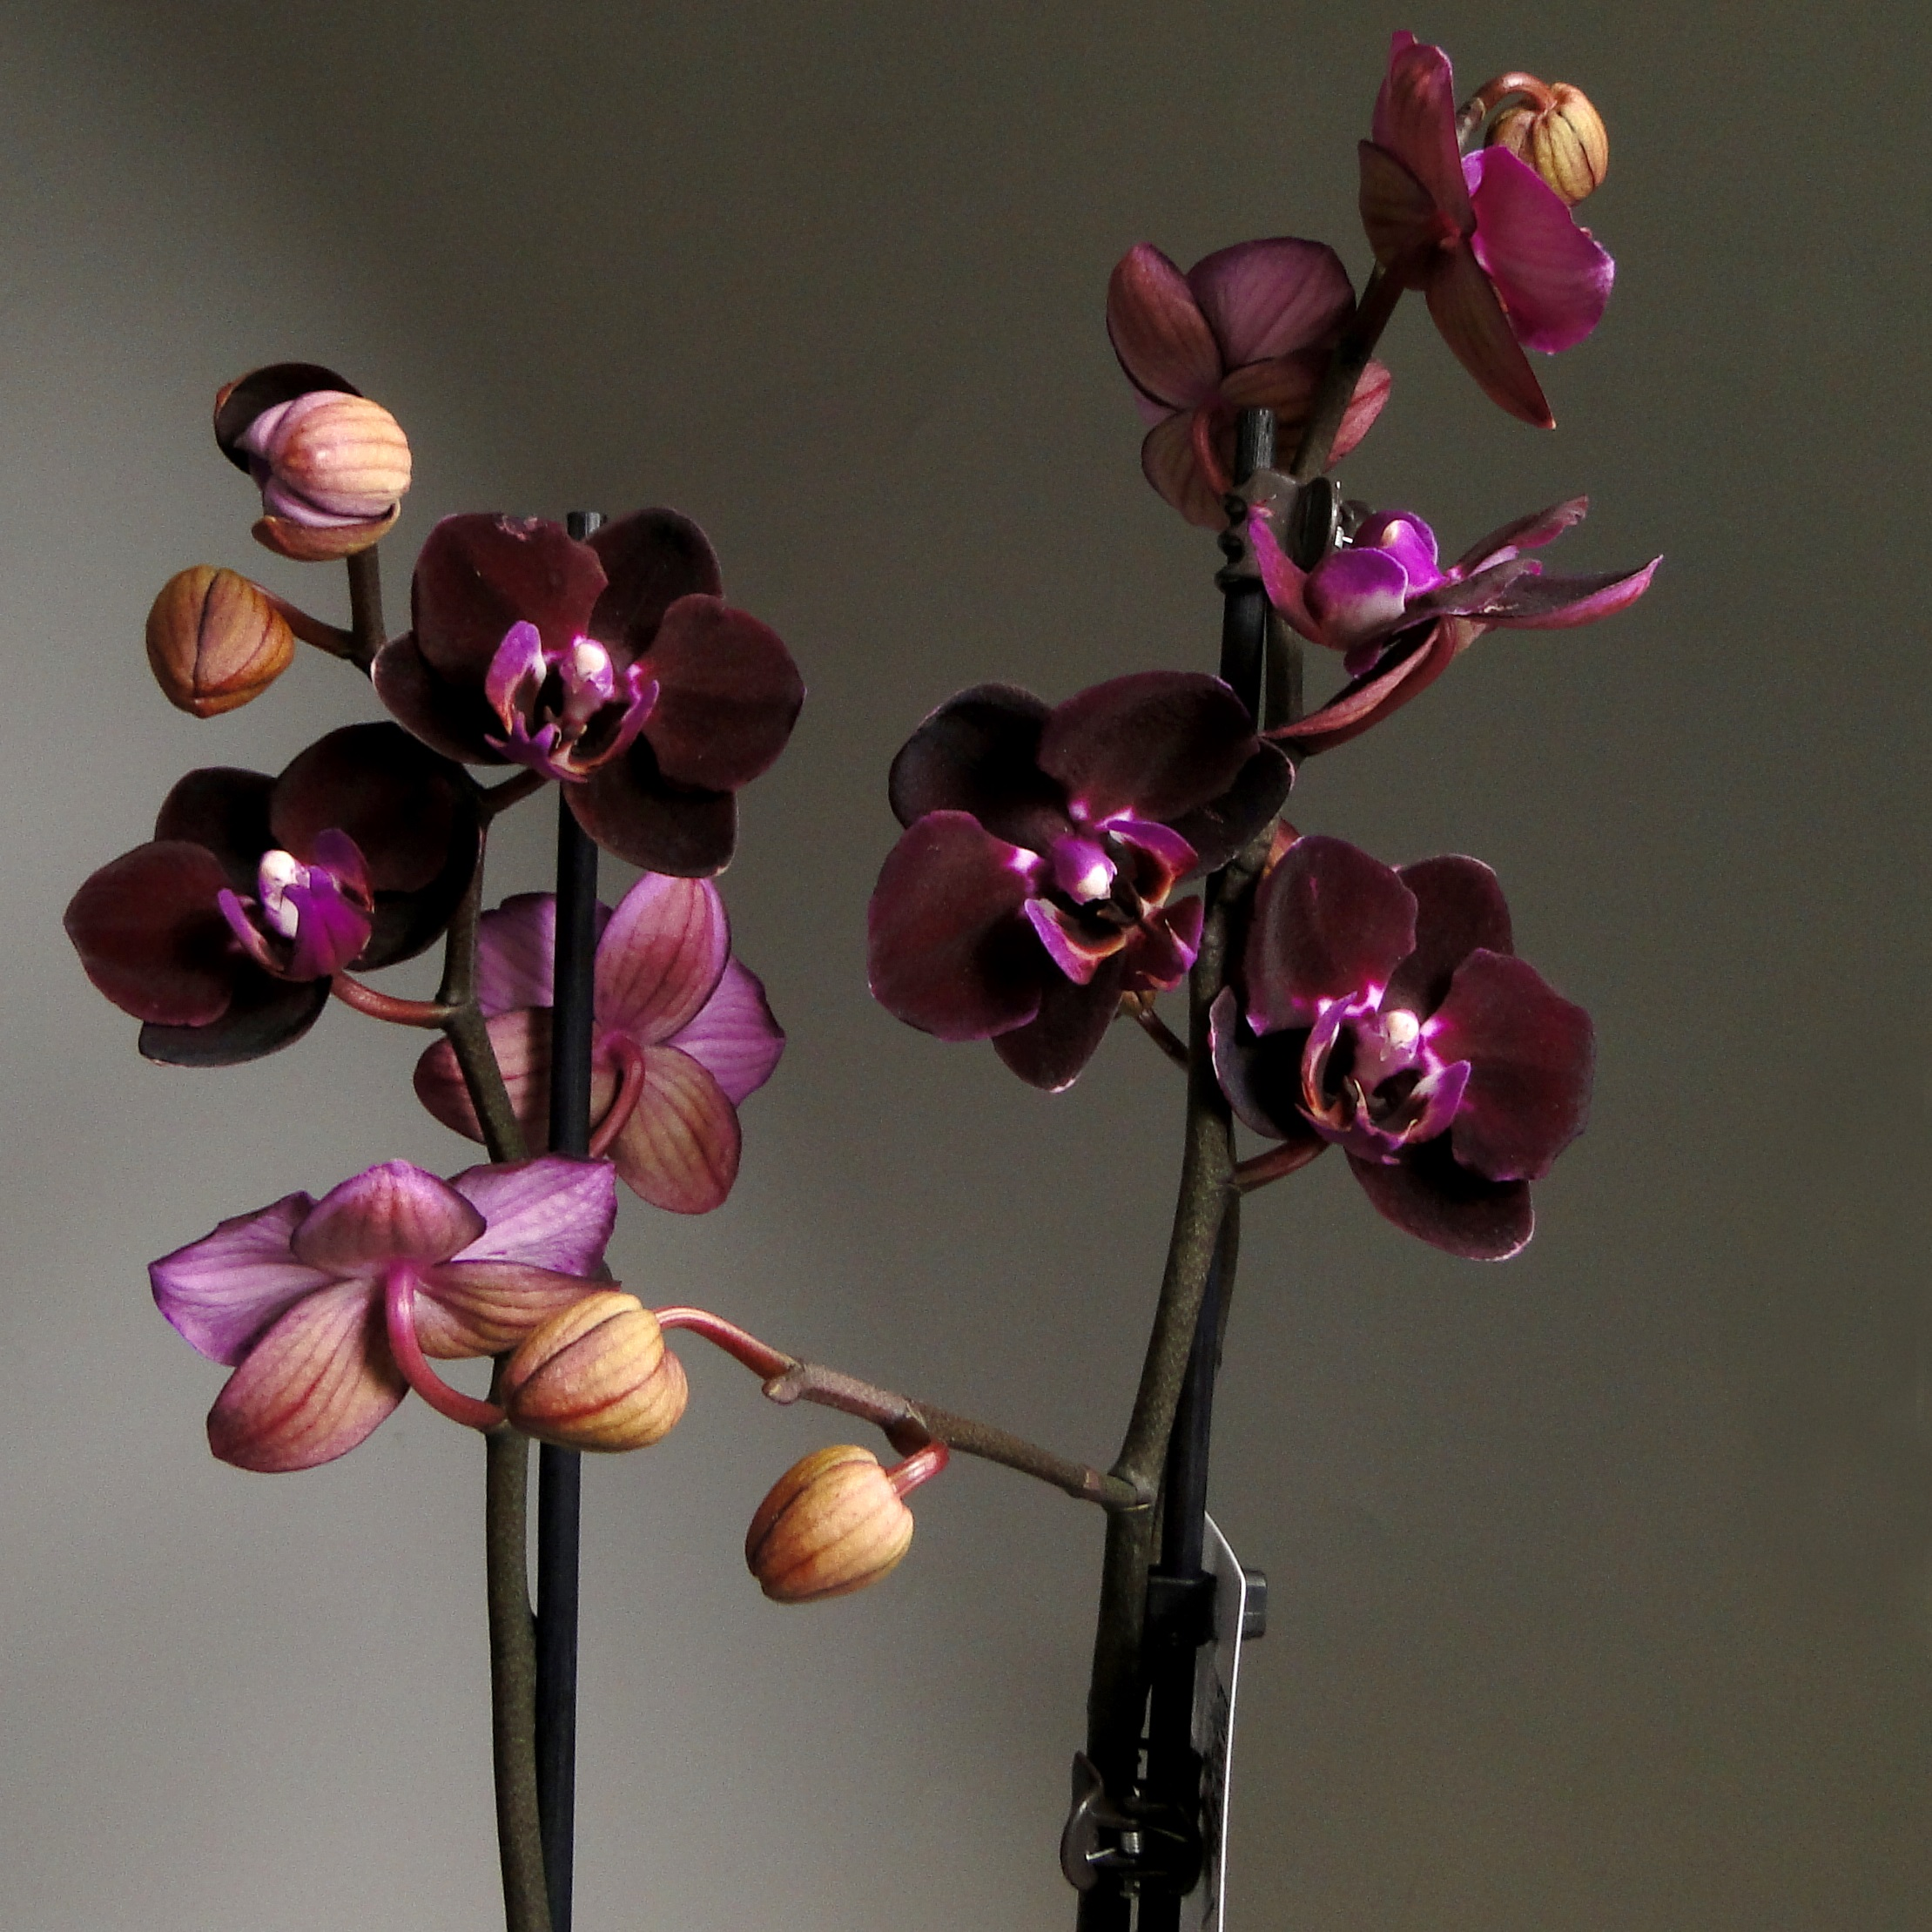 Орхидея Фаленопсис Хеппи Энджел 2 ст